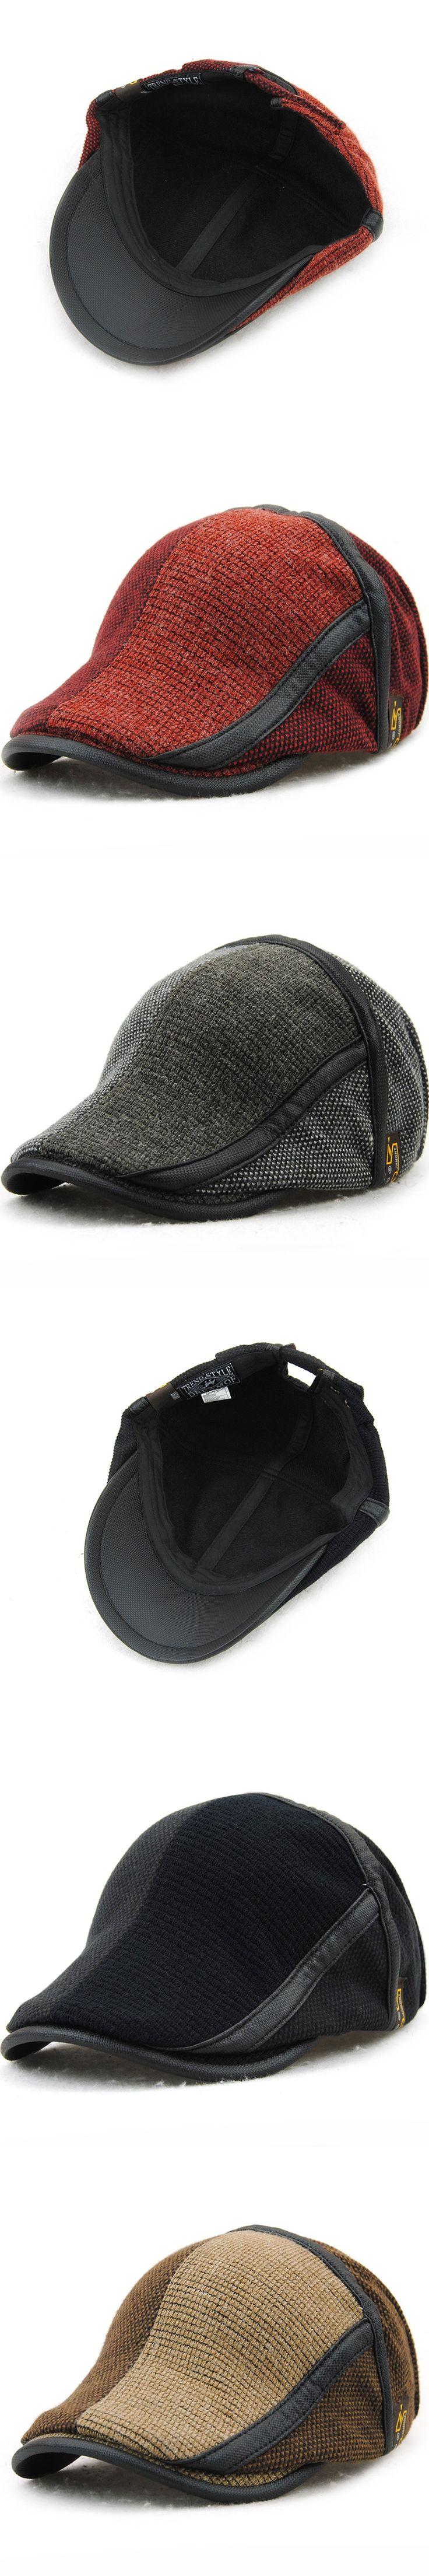 2017 retro berets caps for cotton hats but relaxed visors peaked cap gorras planas flat caps adjustable but 's berets boina bone